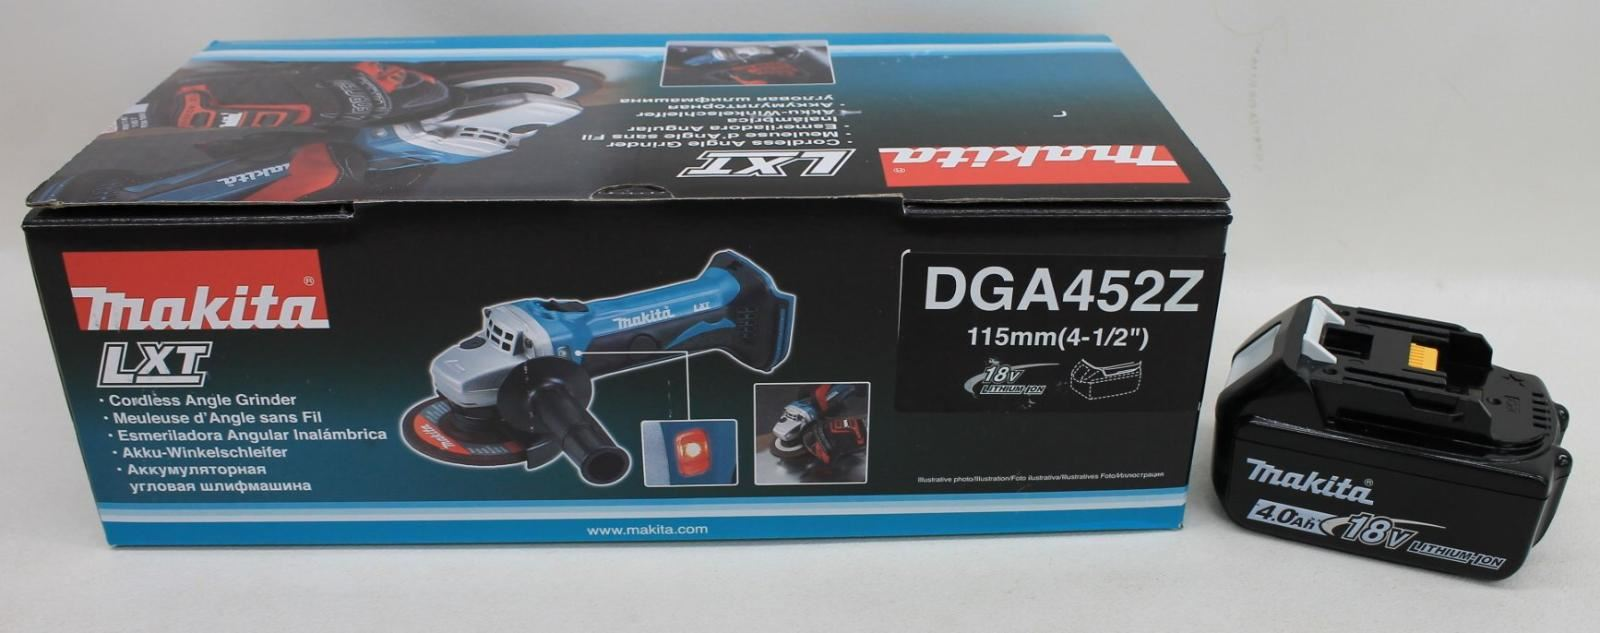 MAKITA-DGA452Z-18V-LXT-4-1-2-034-Cordless-Angle-Grinder-w-BL1840B-Battery-BNIB